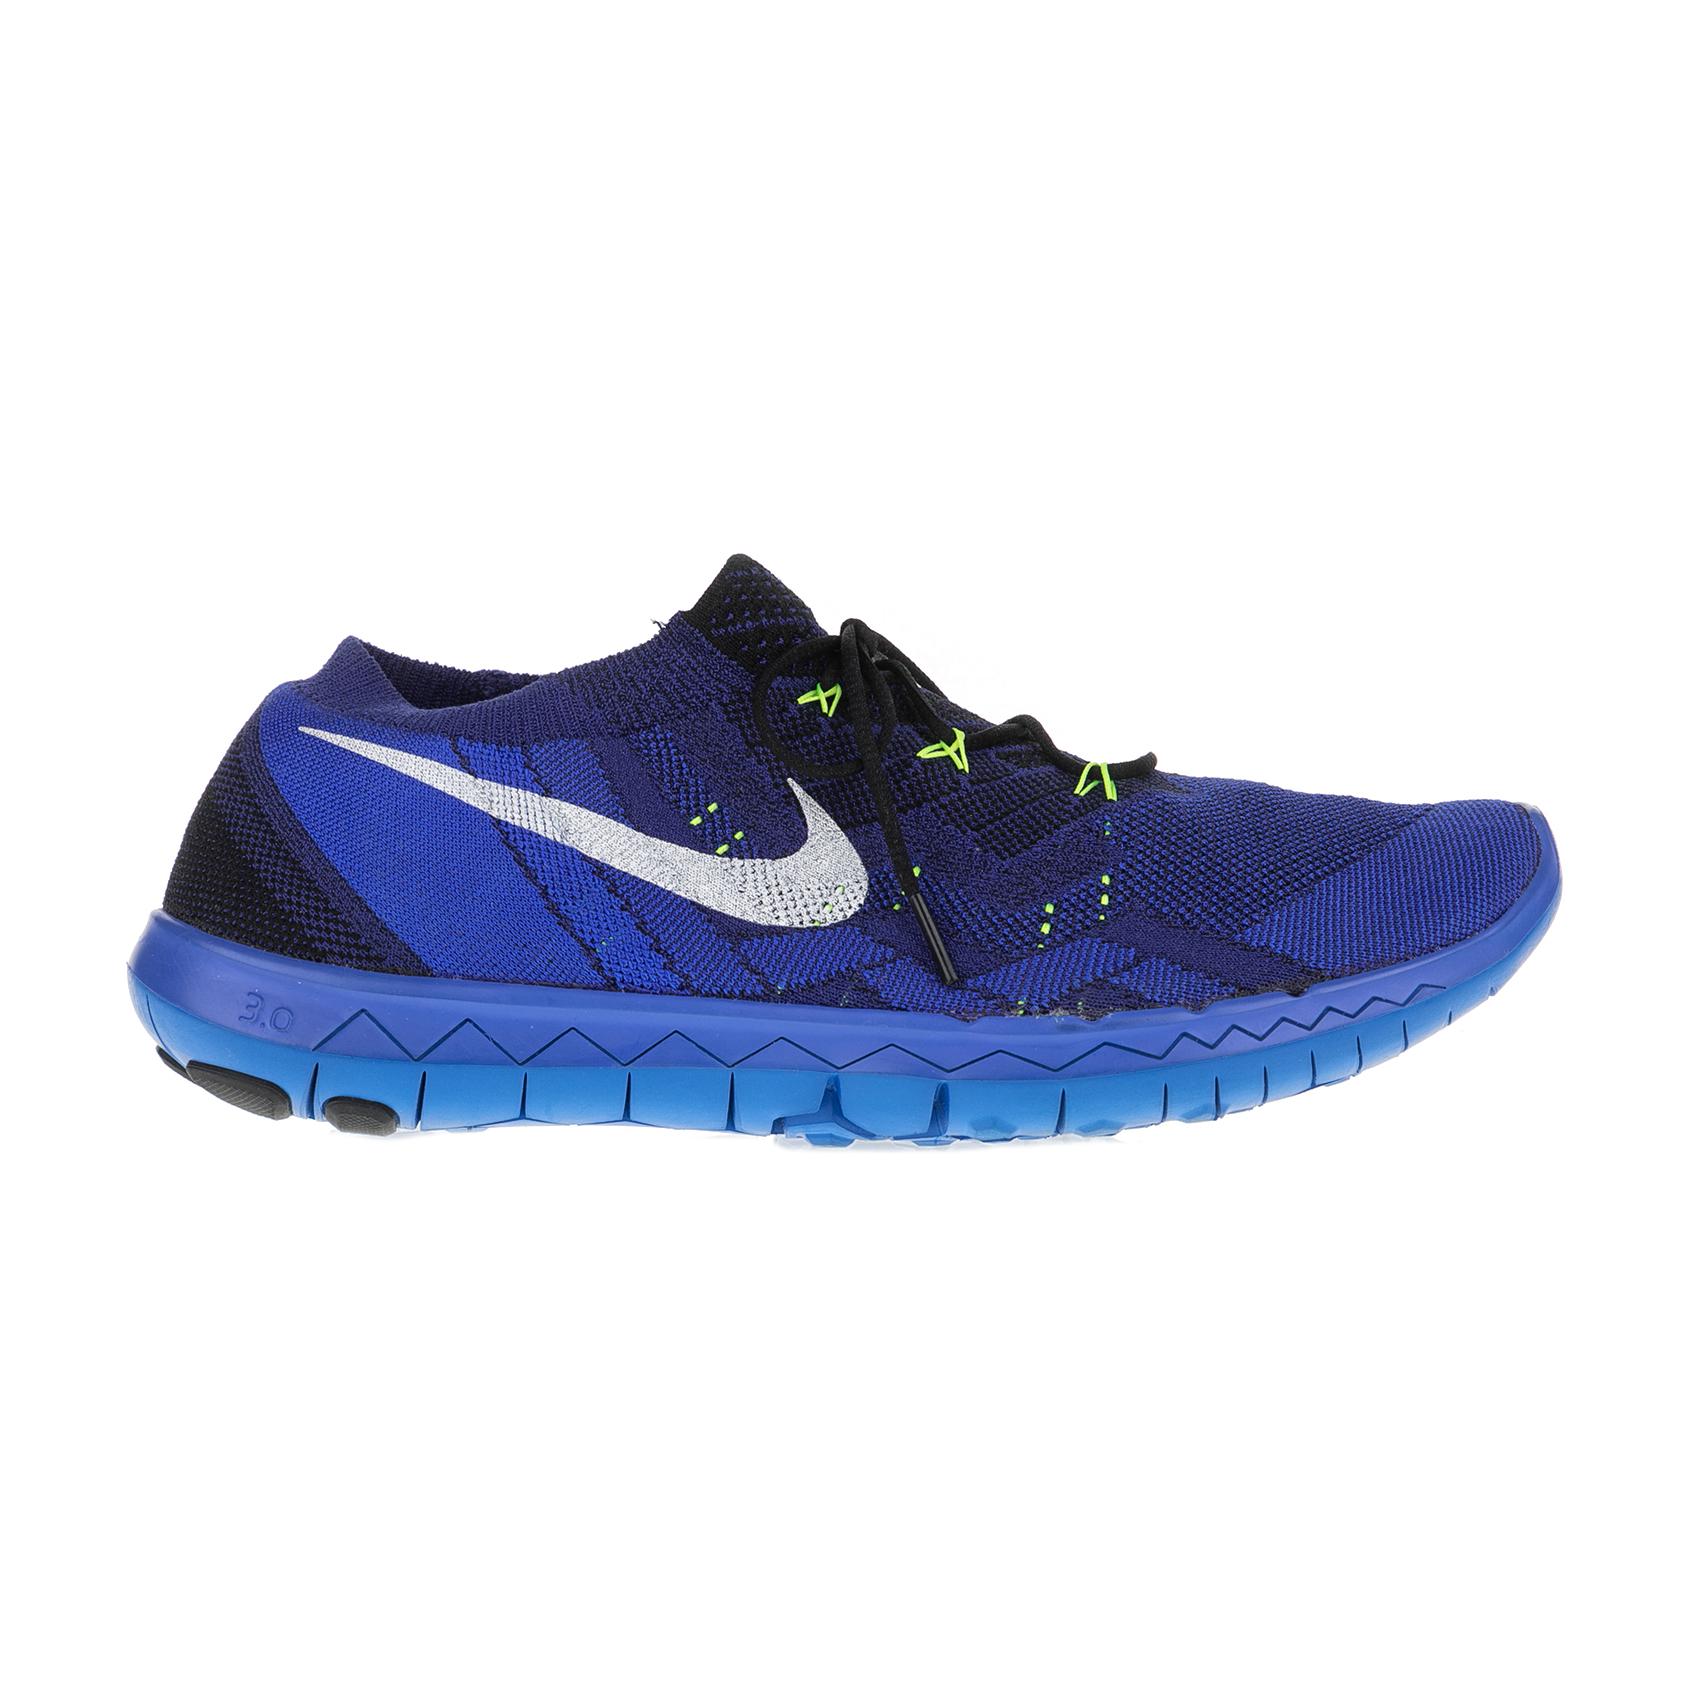 NIKE – Ανδρικά αθλητικά παπούτσια Nike FREE 3.0 FLYKNIT μπλε